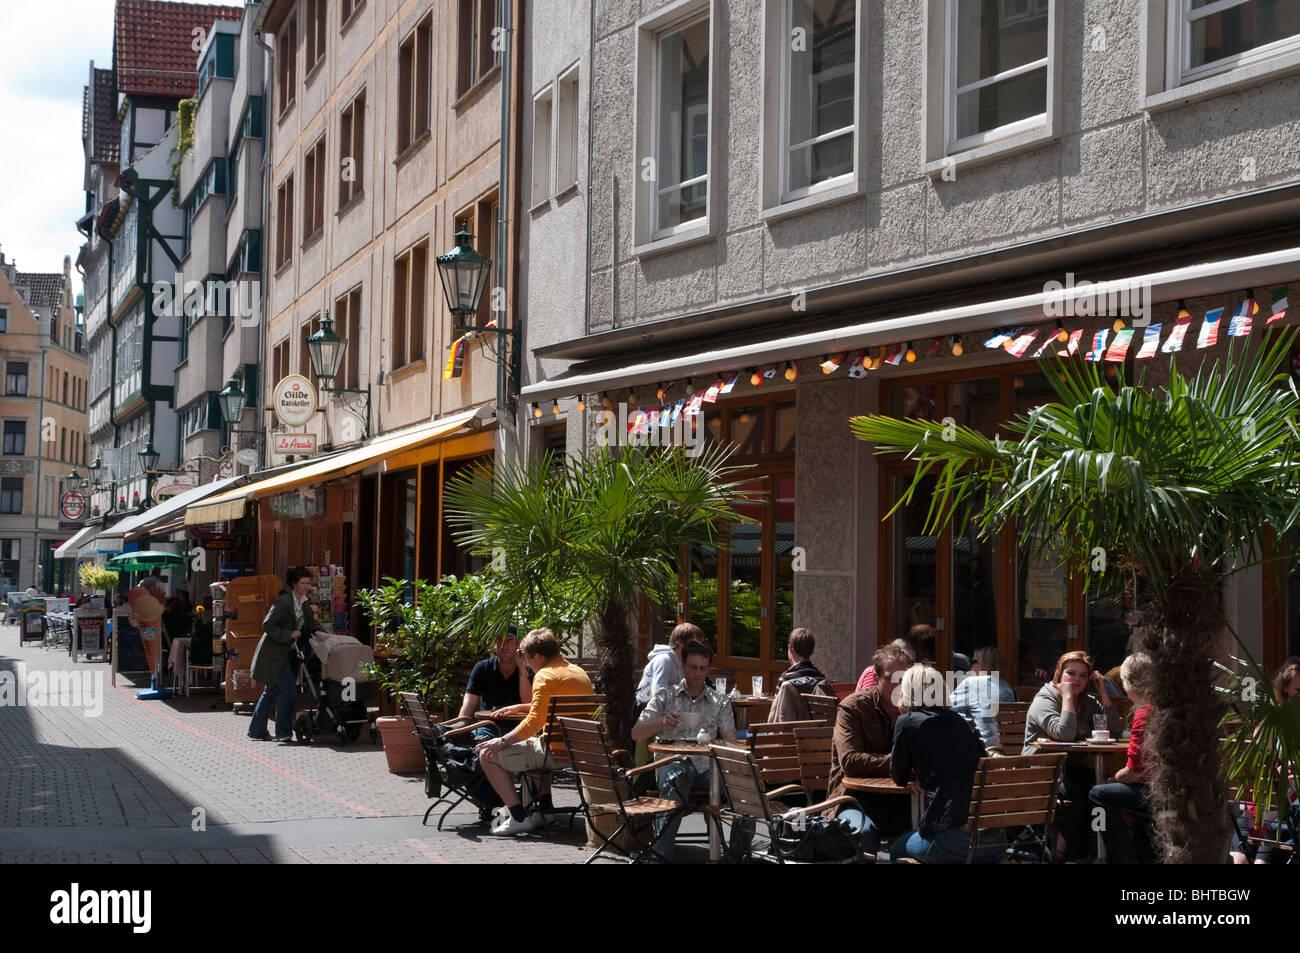 Altstadt, Kramerstrasse, Hannover, Niedersachsen, Deutschland | Hannover, old town, Kramer street, Lower Saxony, - Stock Image